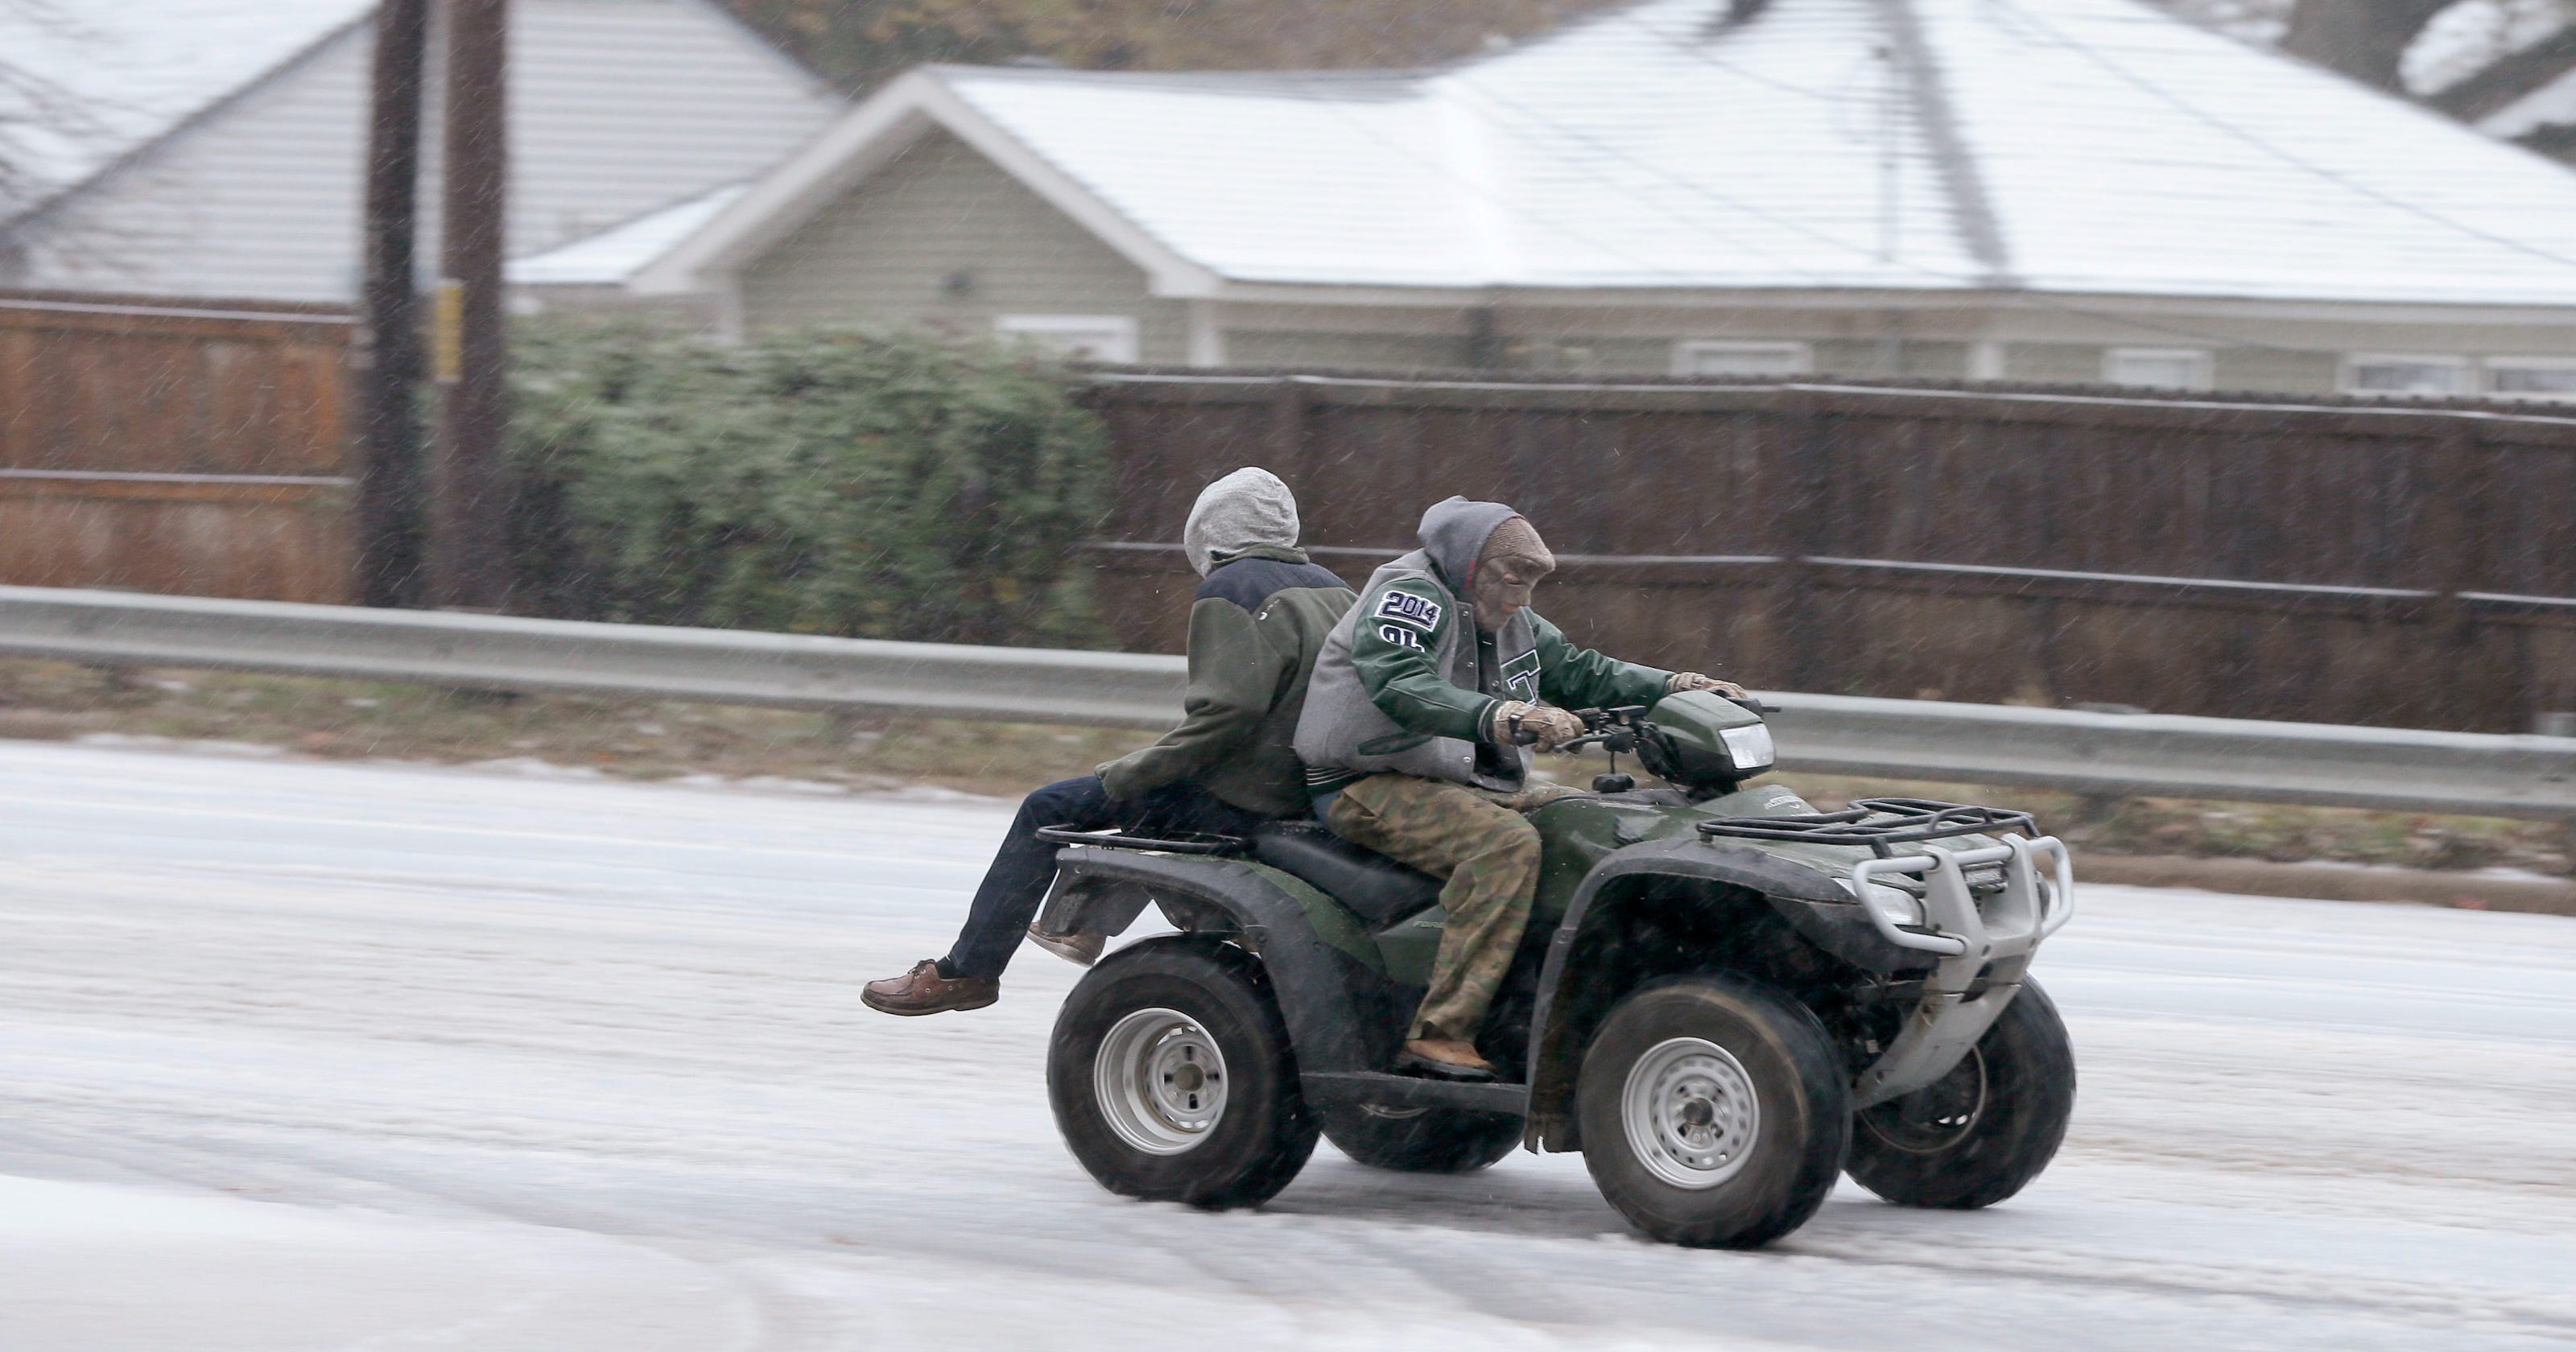 Study: ATV crash deaths rising on public roads